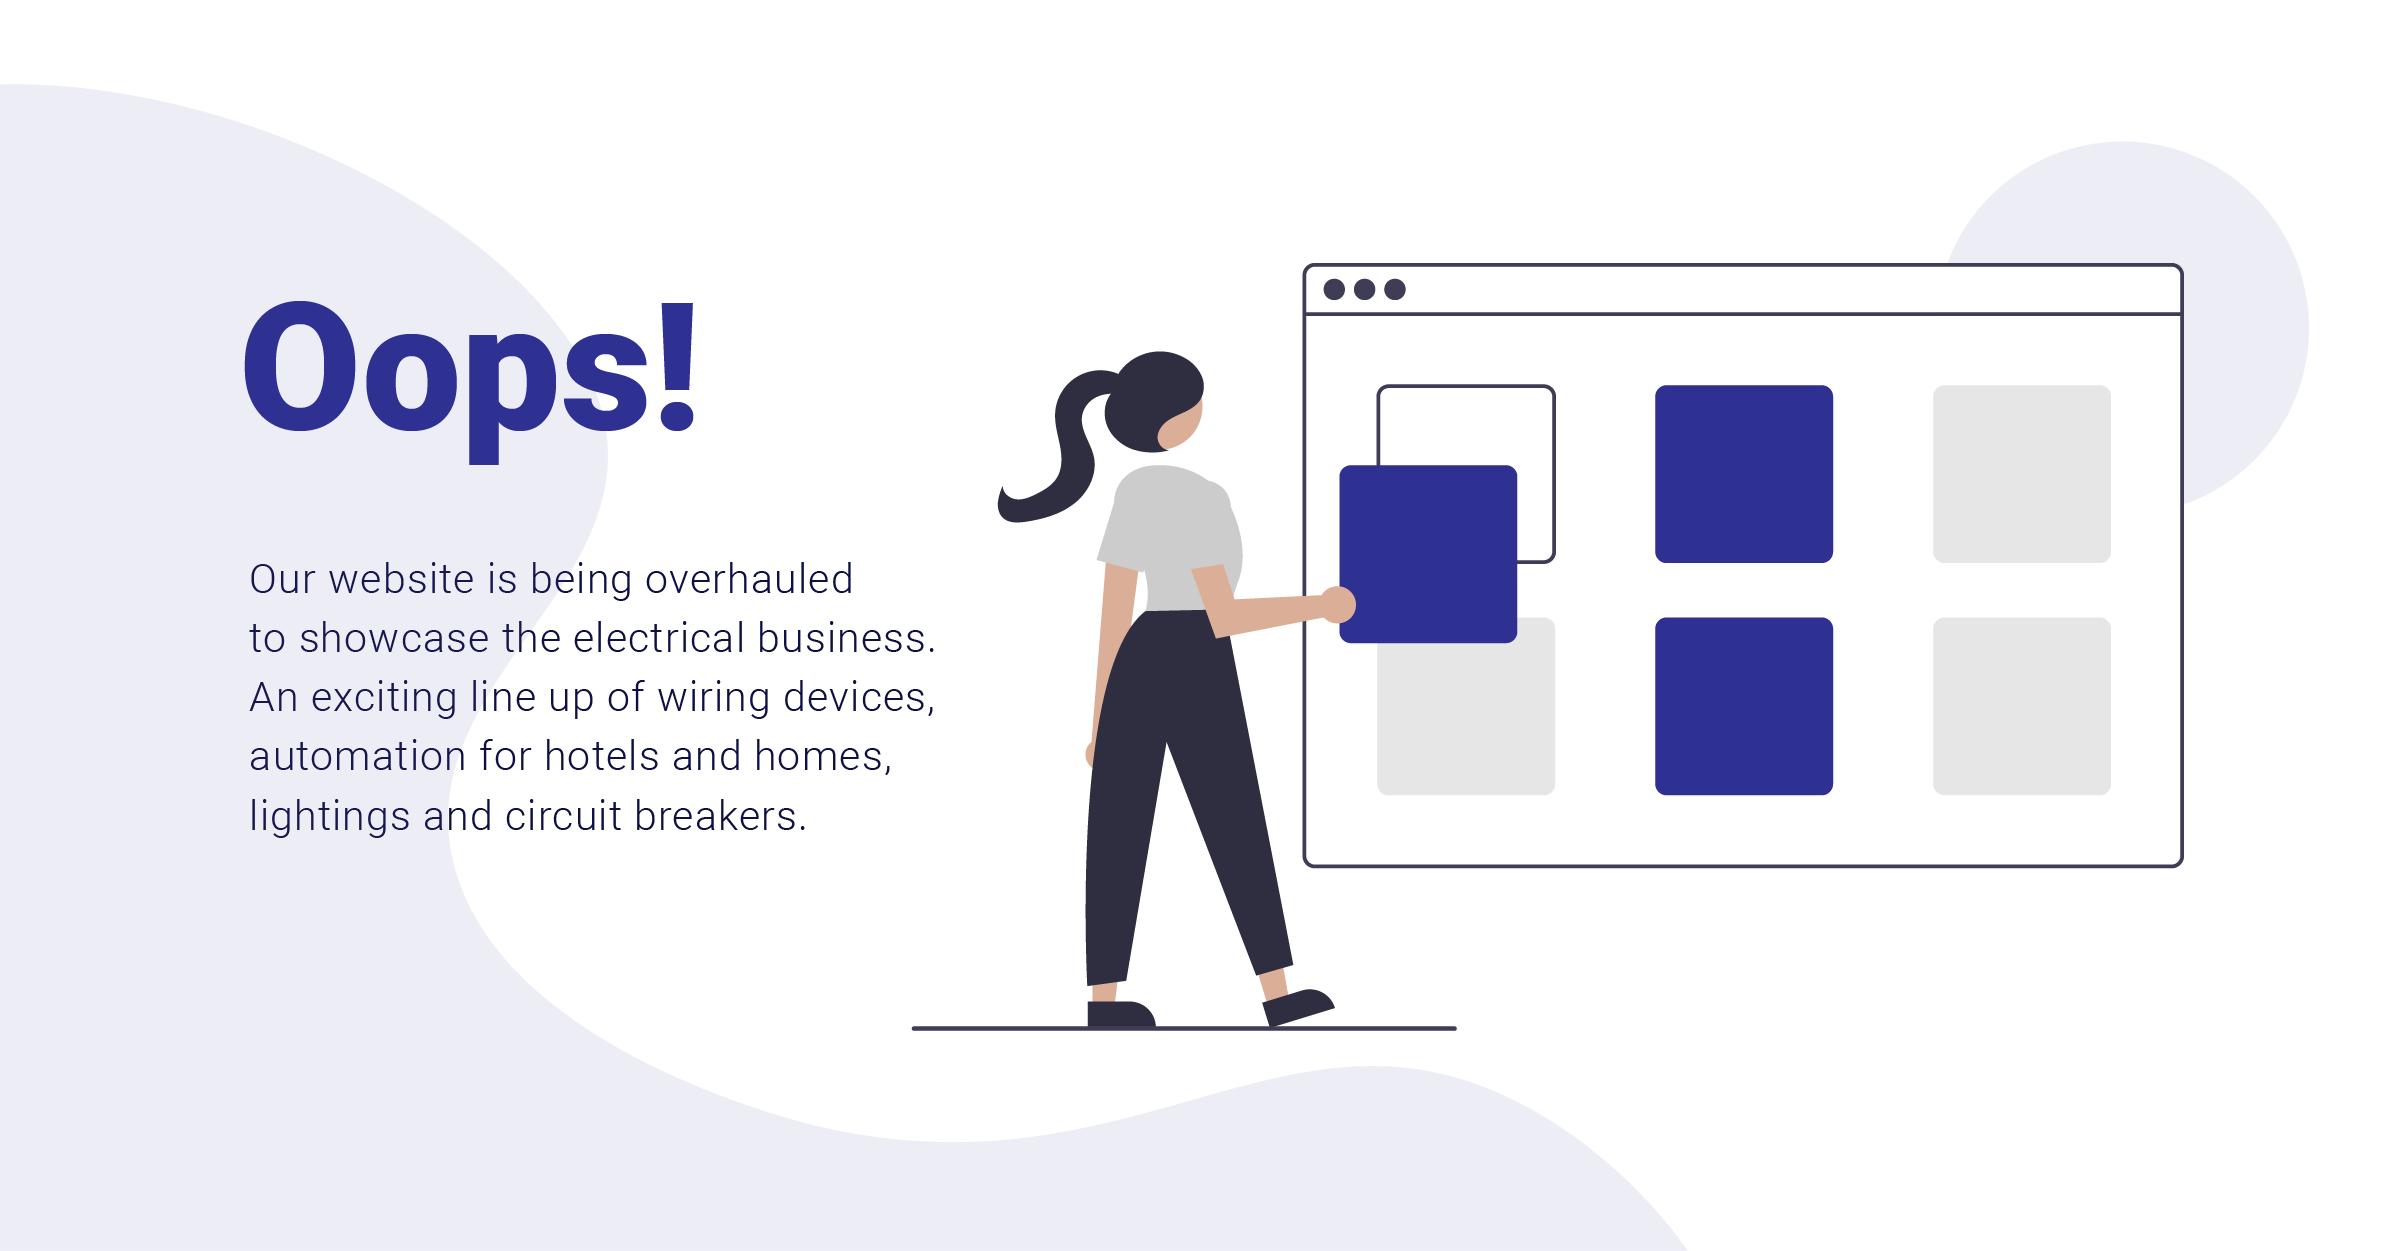 iptv solutions, room control system, hotel phones